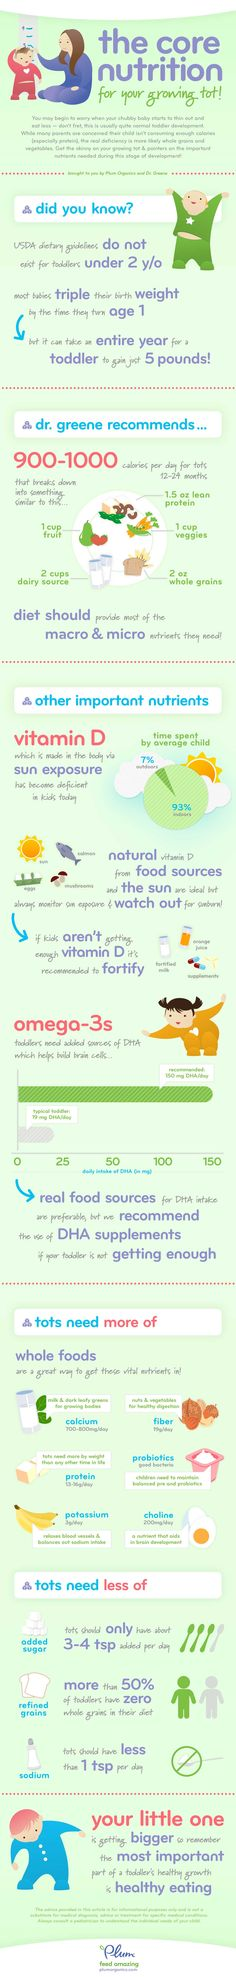 Toddler Nutrition & Development @ Pinfographics